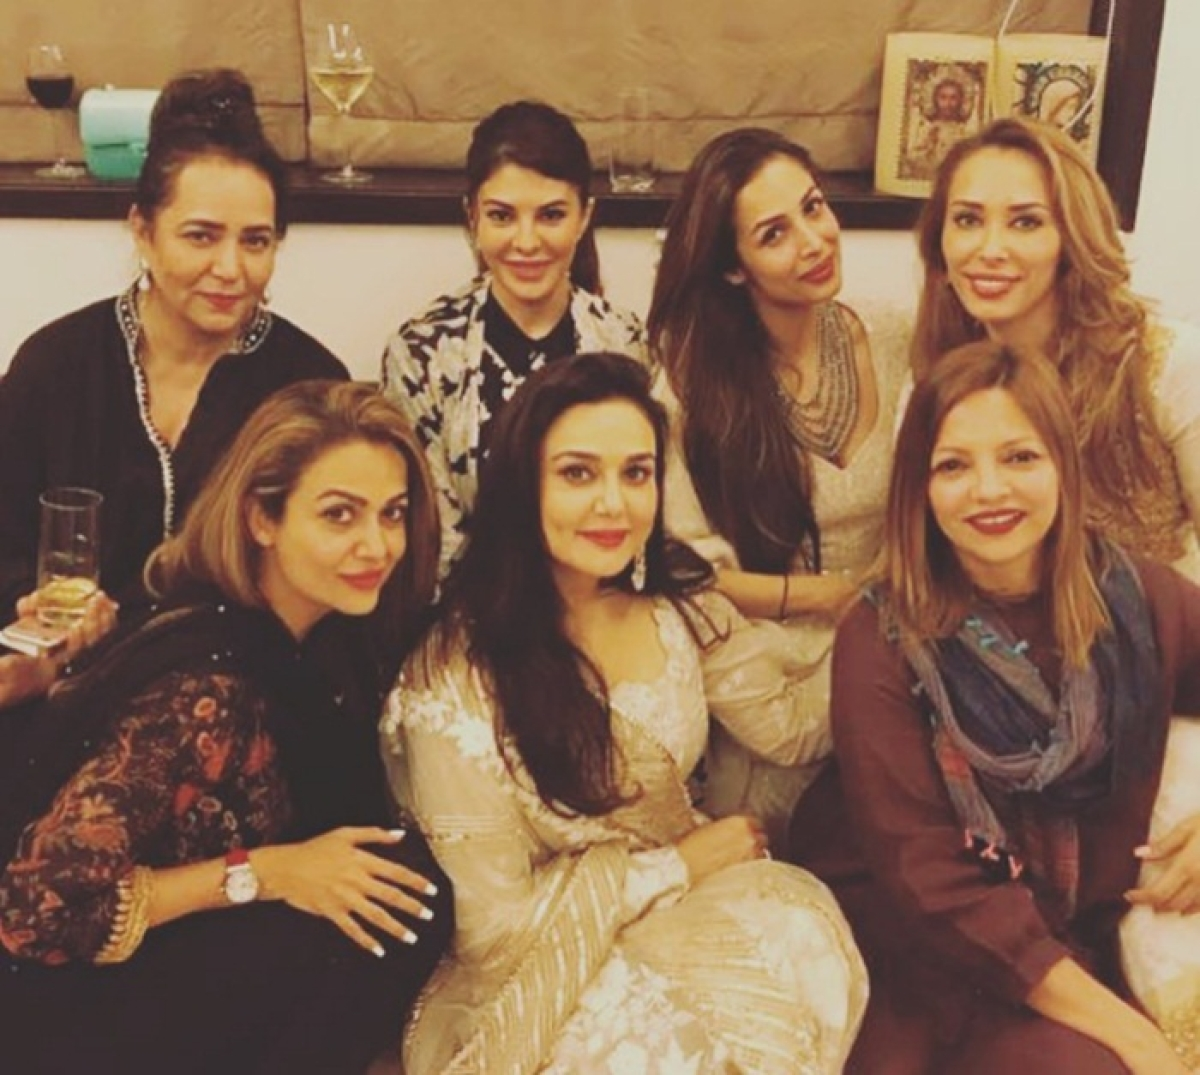 Eid al-Fitr 2017: Amrita Arora celebrates with Malaika and Iulia at Salman Khan's residence